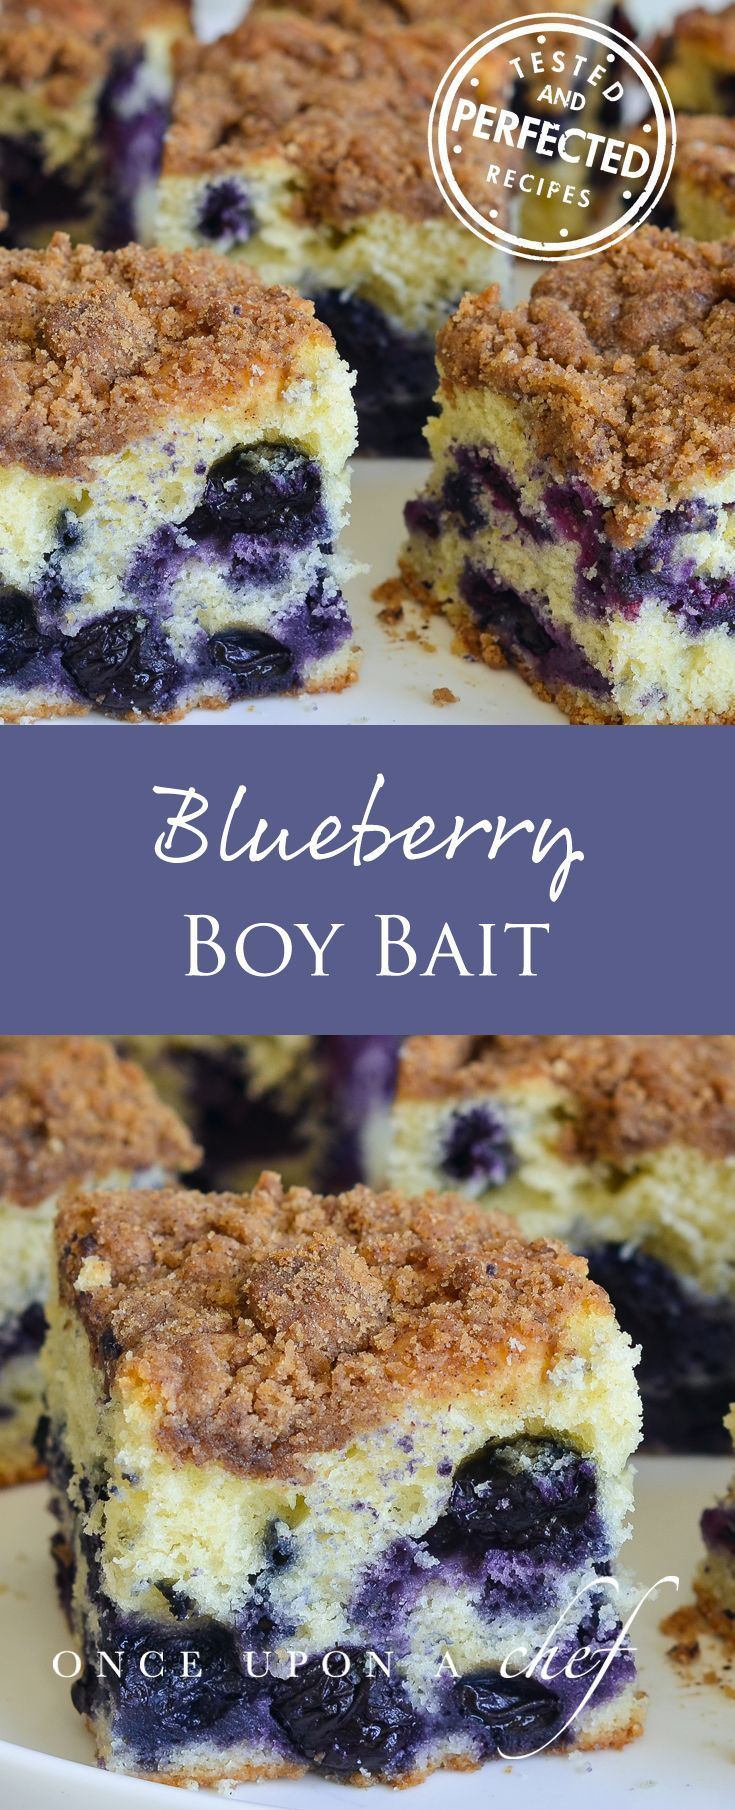 Blueberry Coffee Cake (aka Boy Bait)